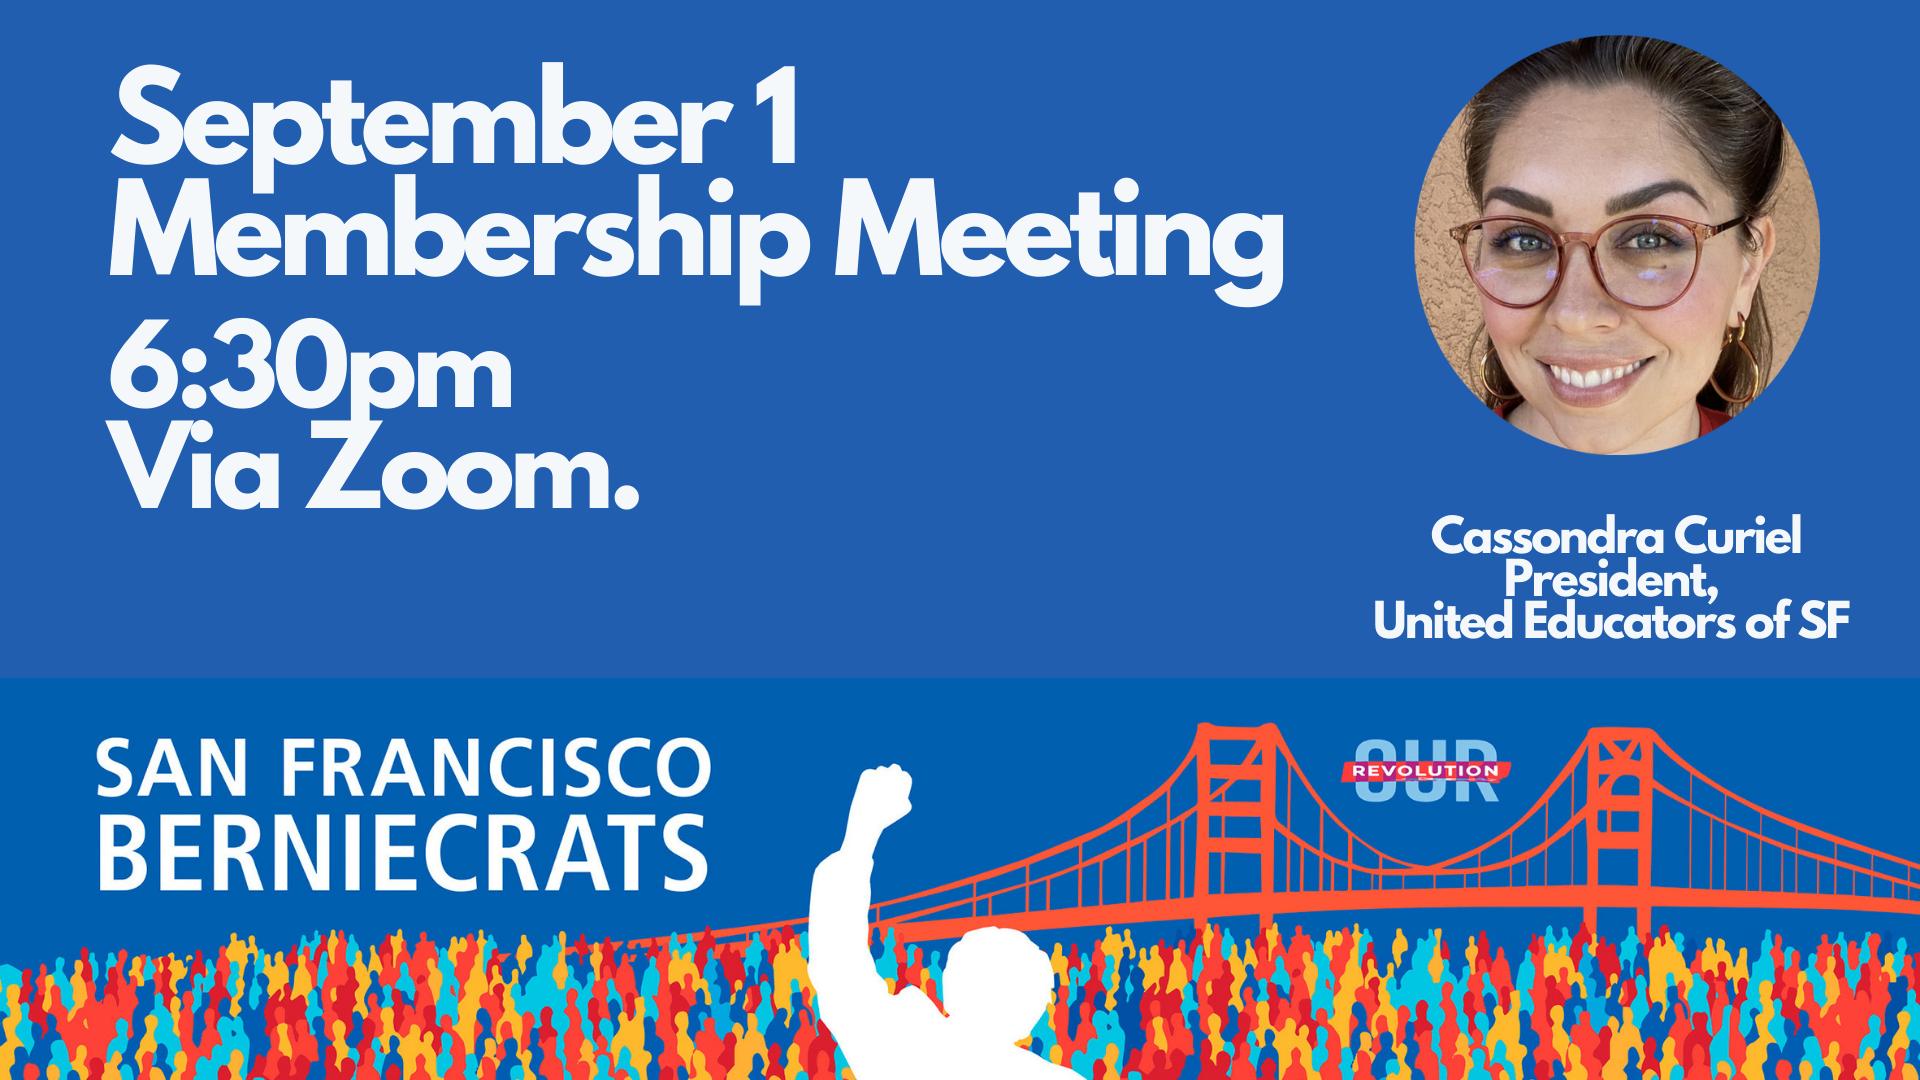 SF Berniecrats monthly meeting @ Online